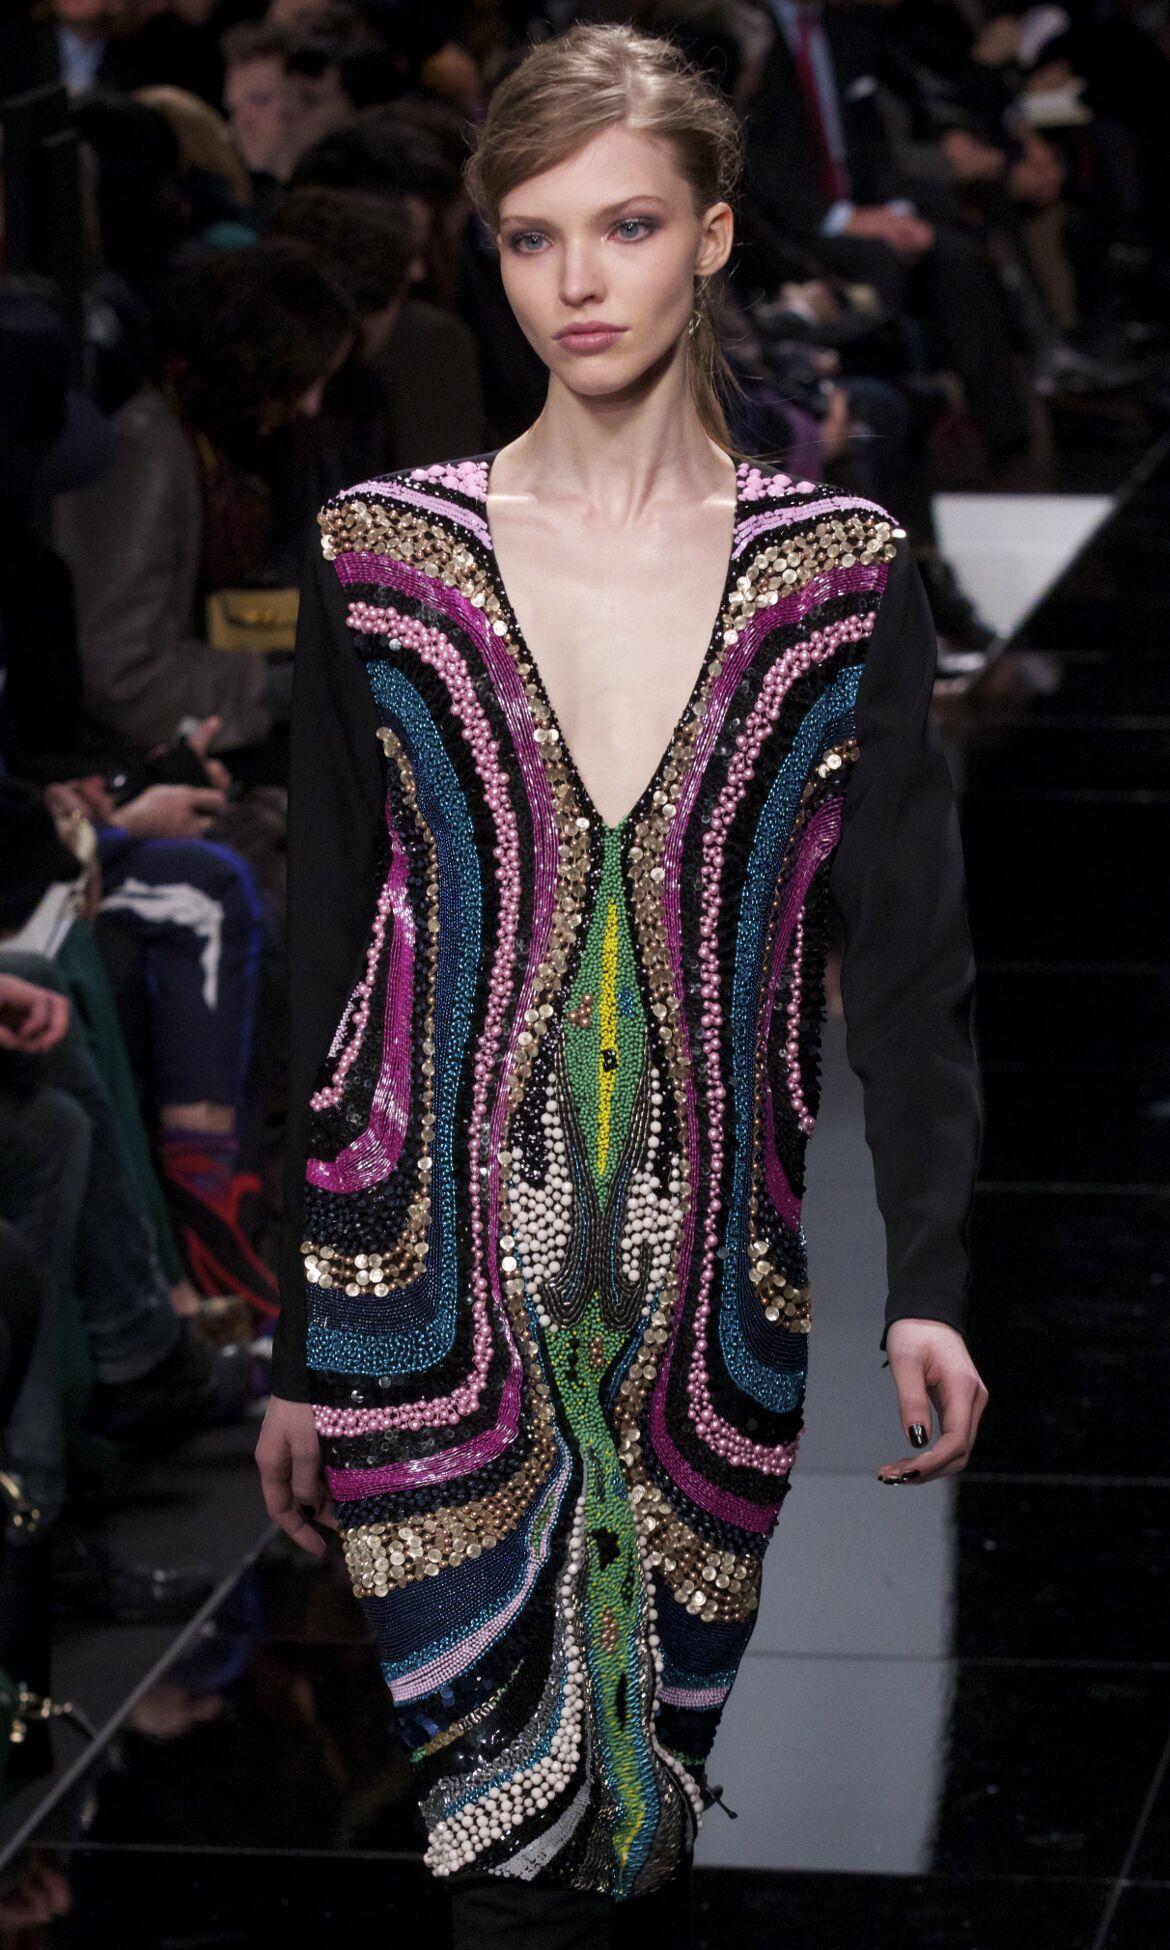 Iceberg Fashion Show 2013 Milan Fashion Week